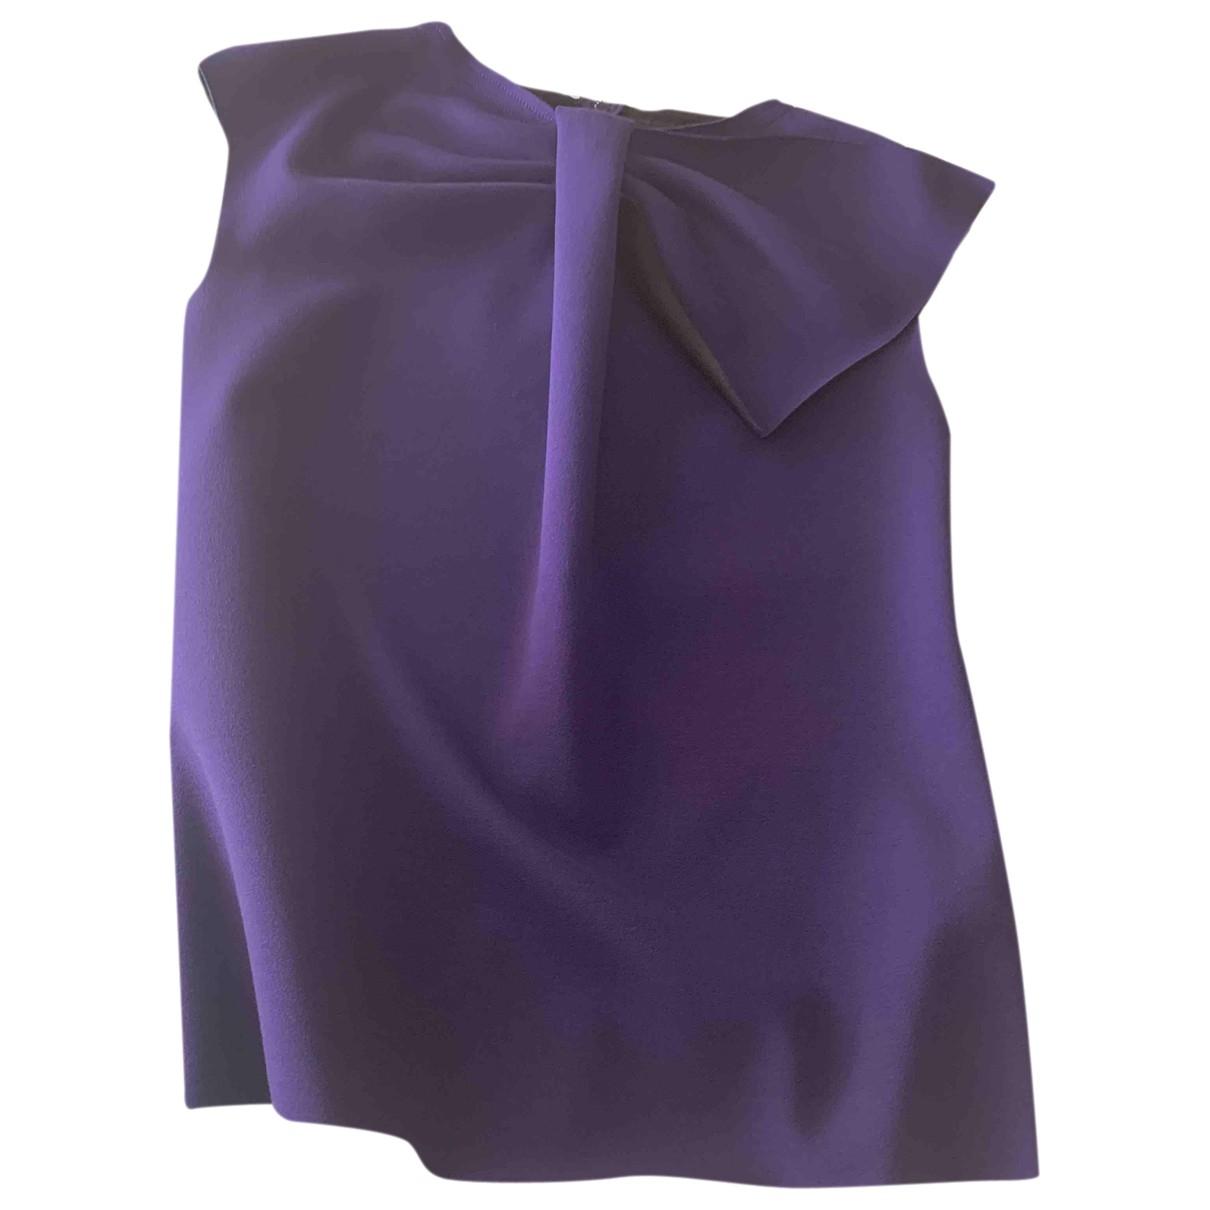 Emporio Armani \N Purple  top for Women 44 IT